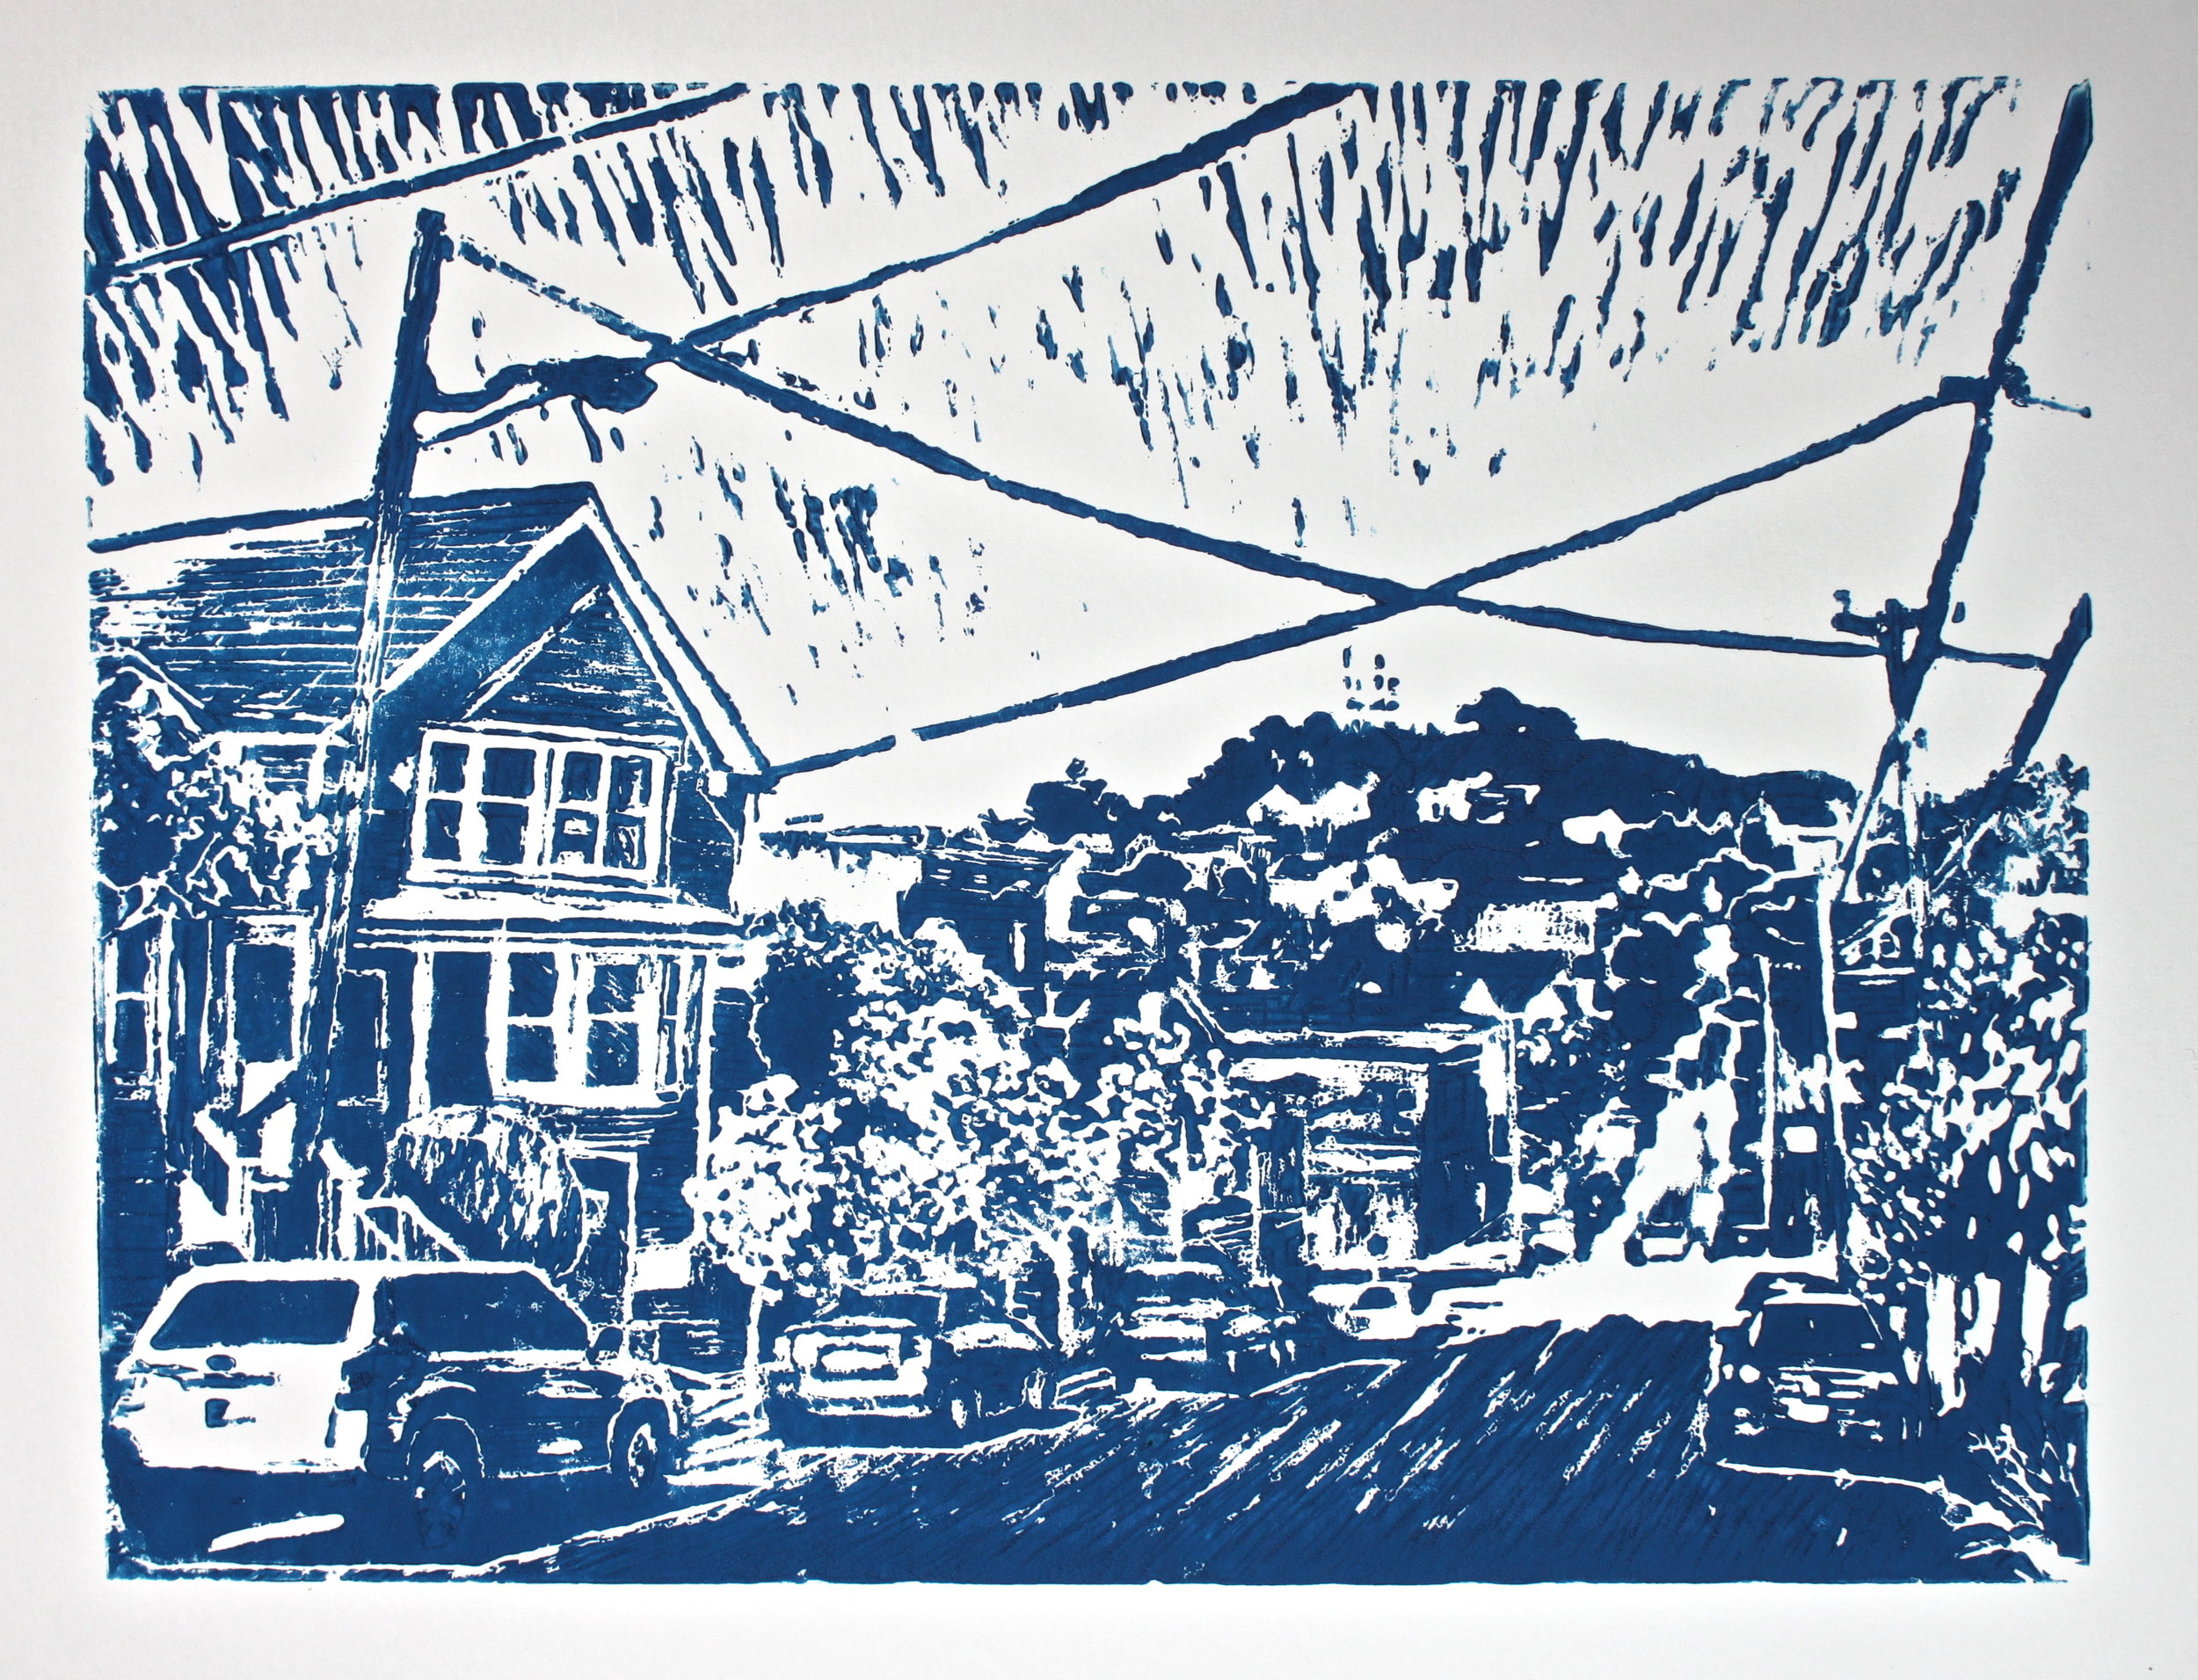 Bernal Hill, 2016, 9 x 11 inches, linoleum block print